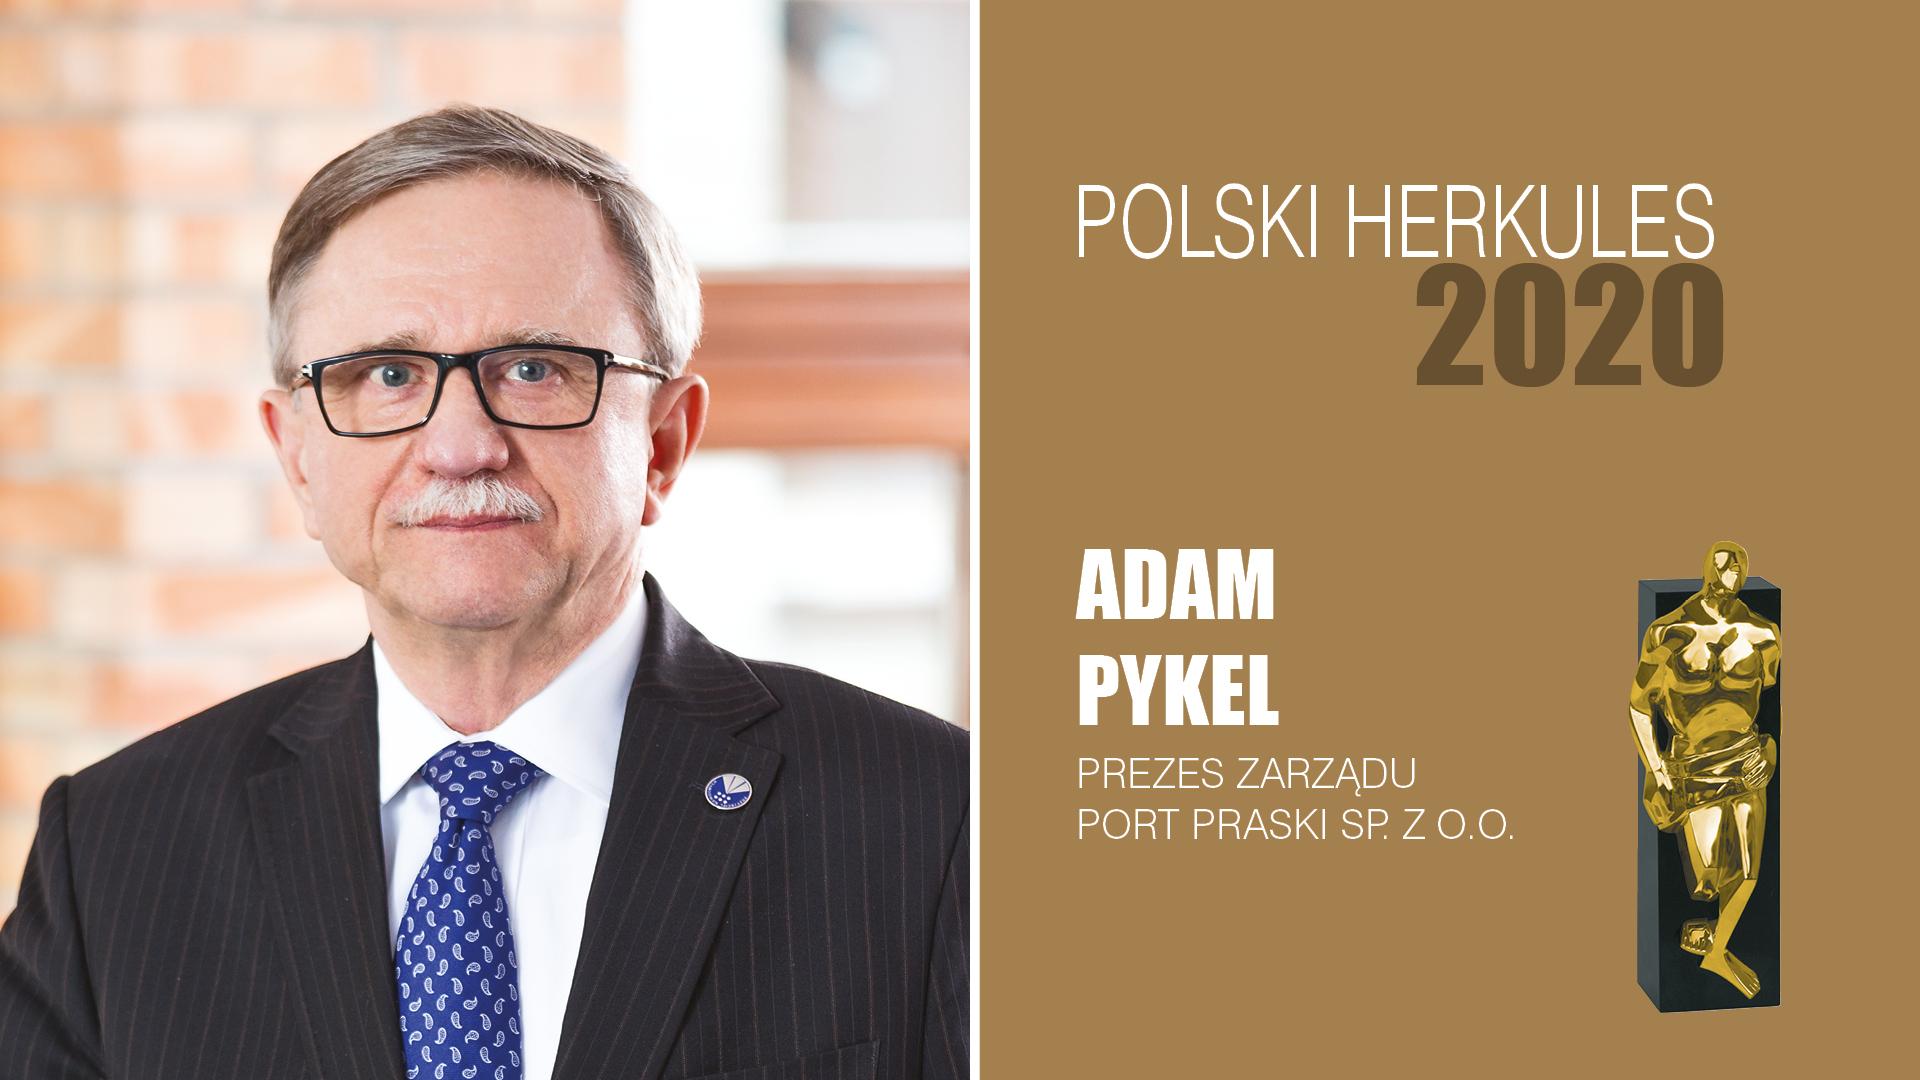 Adam Pykel – Polski Herkules 2020